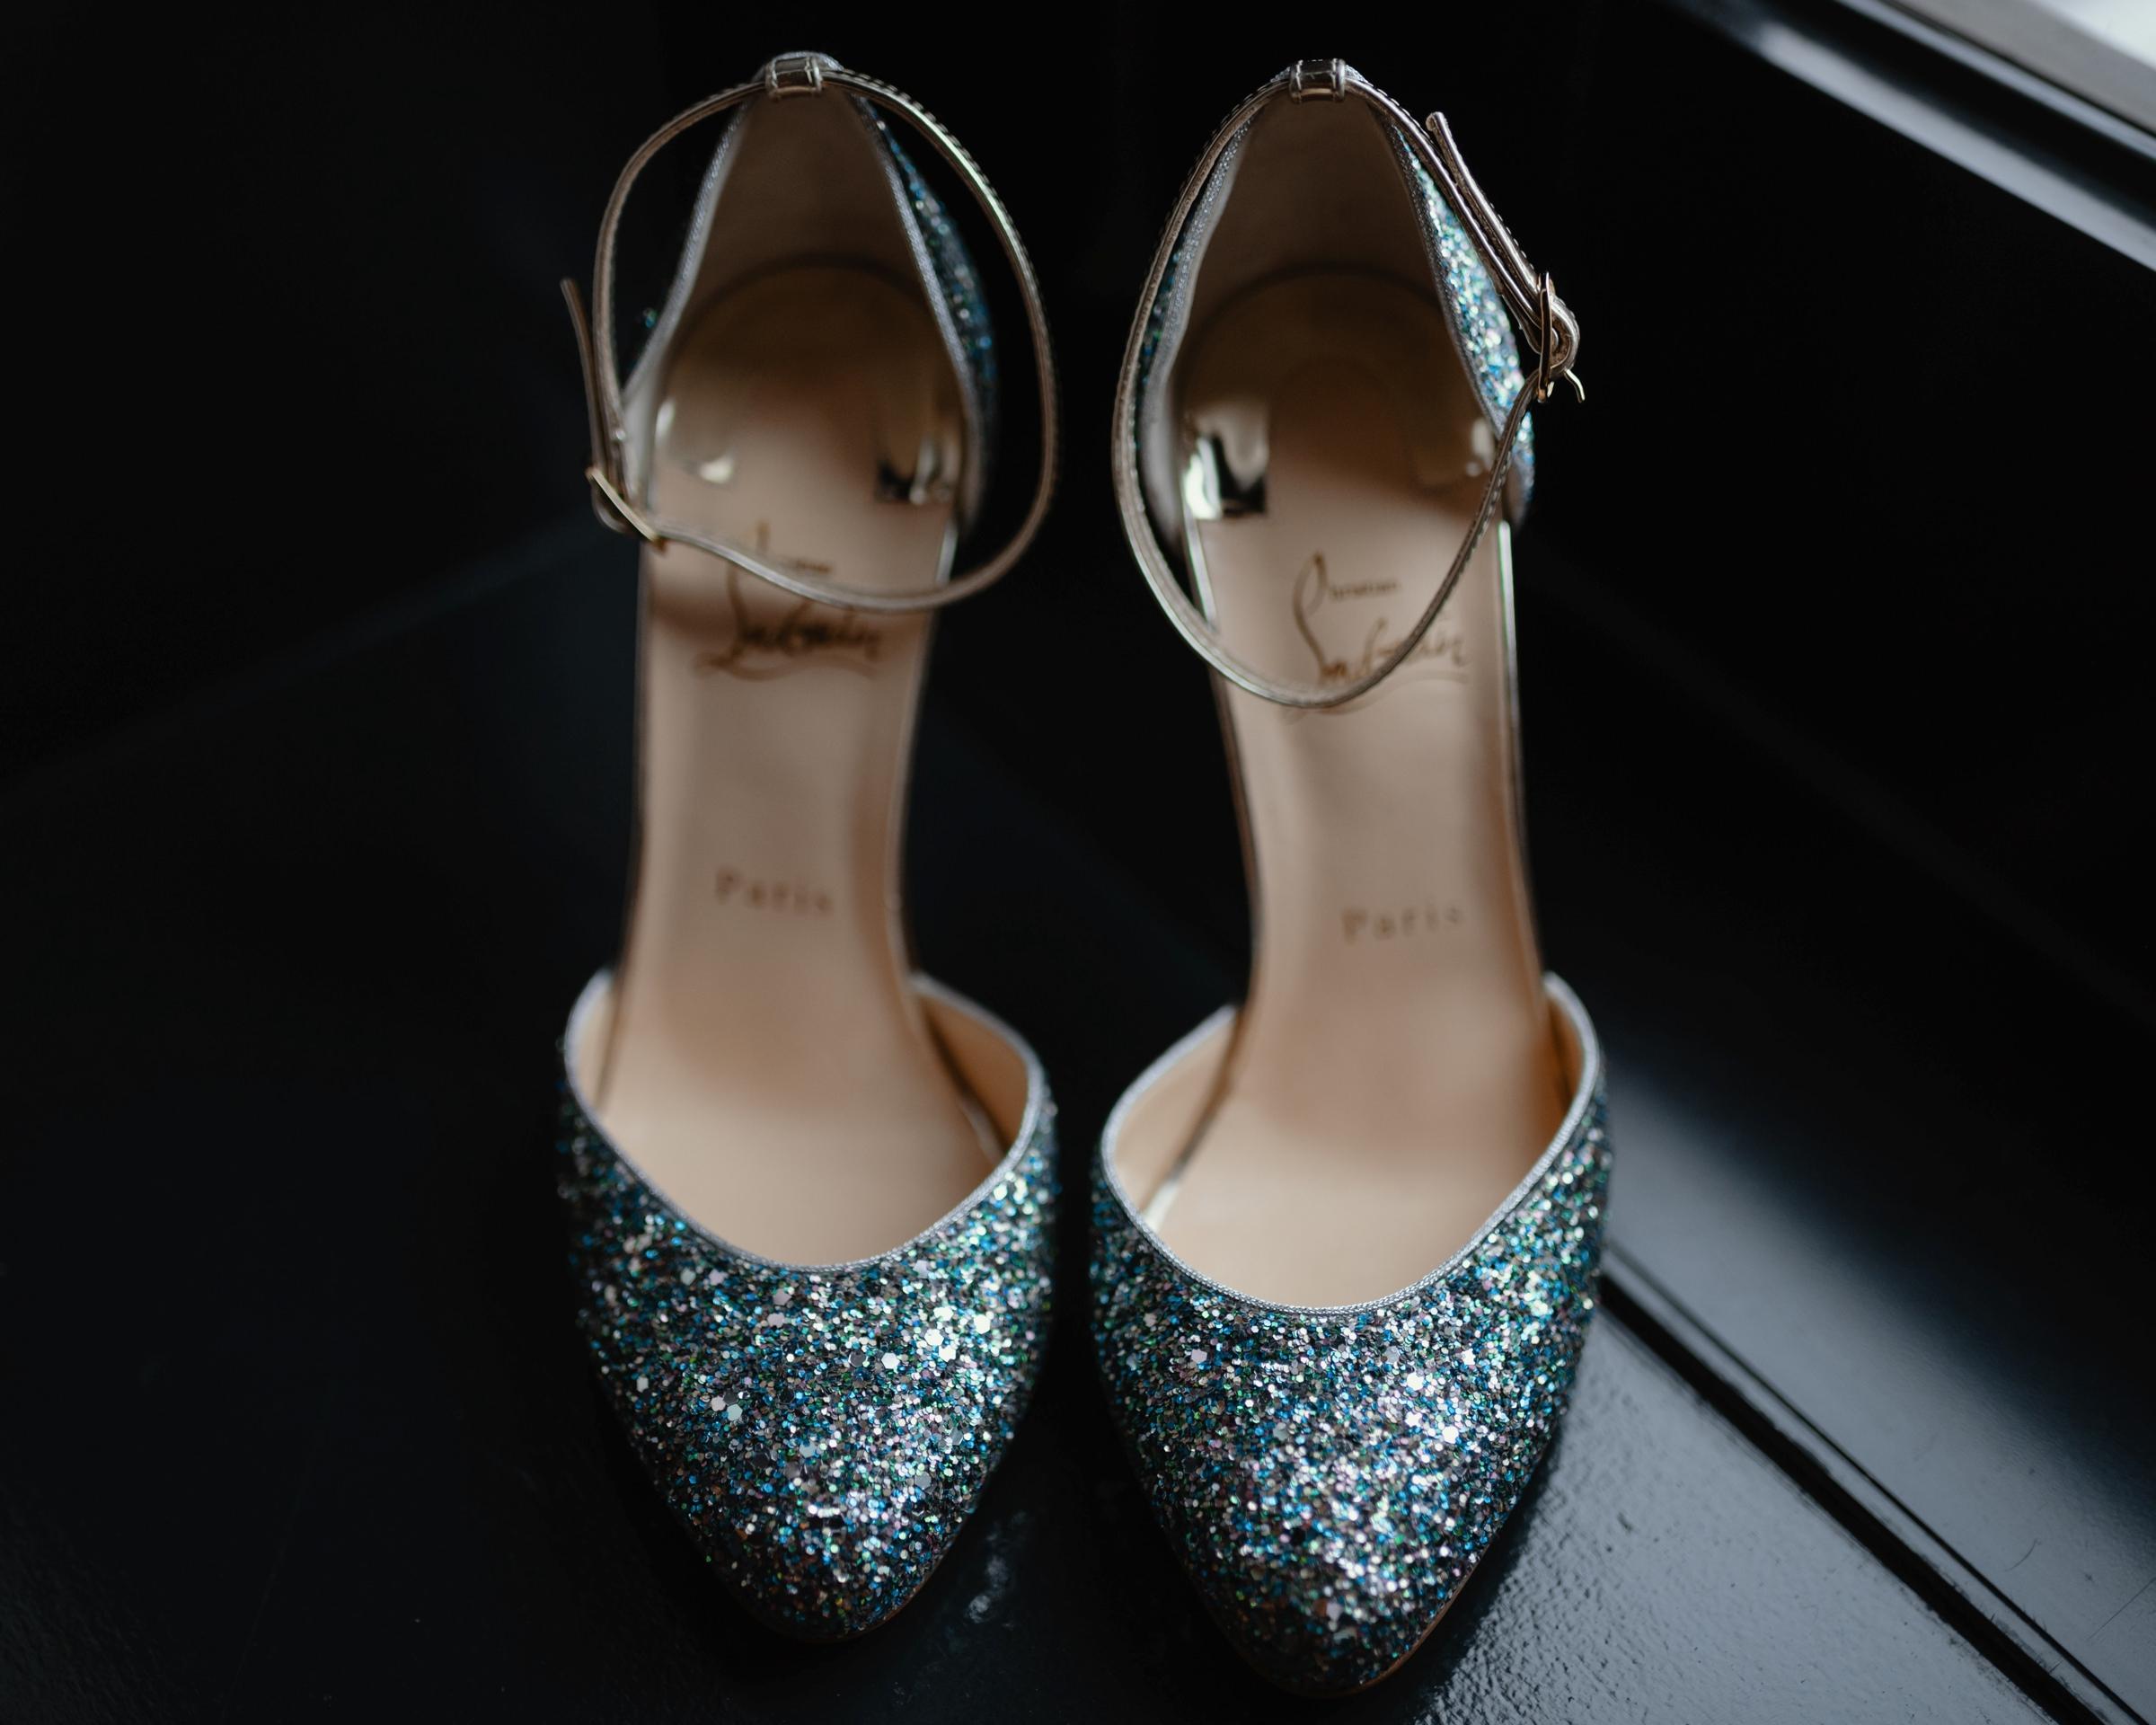 silver-sparkly-shoe-detail-photo-new-orleans-austin-houston-photo-by-dark-roux